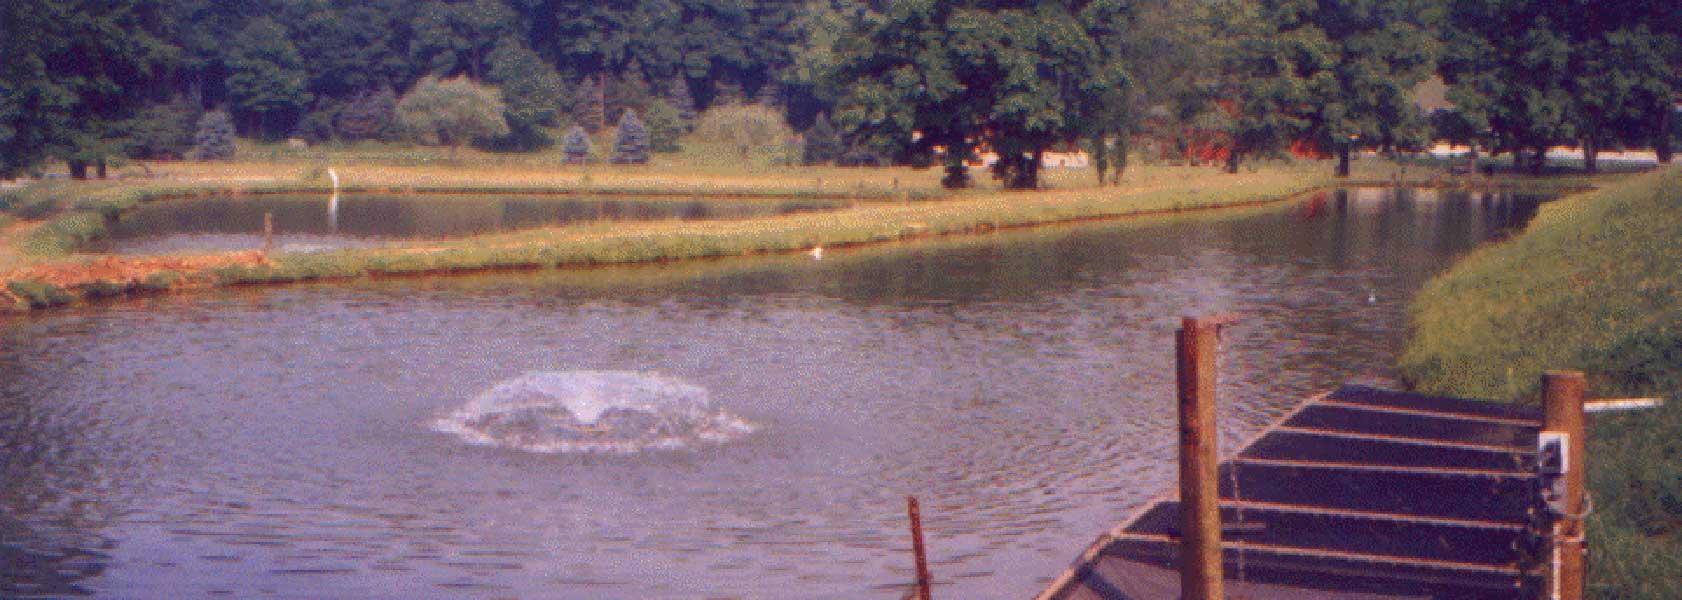 hero-fendersfishfarm-pond1